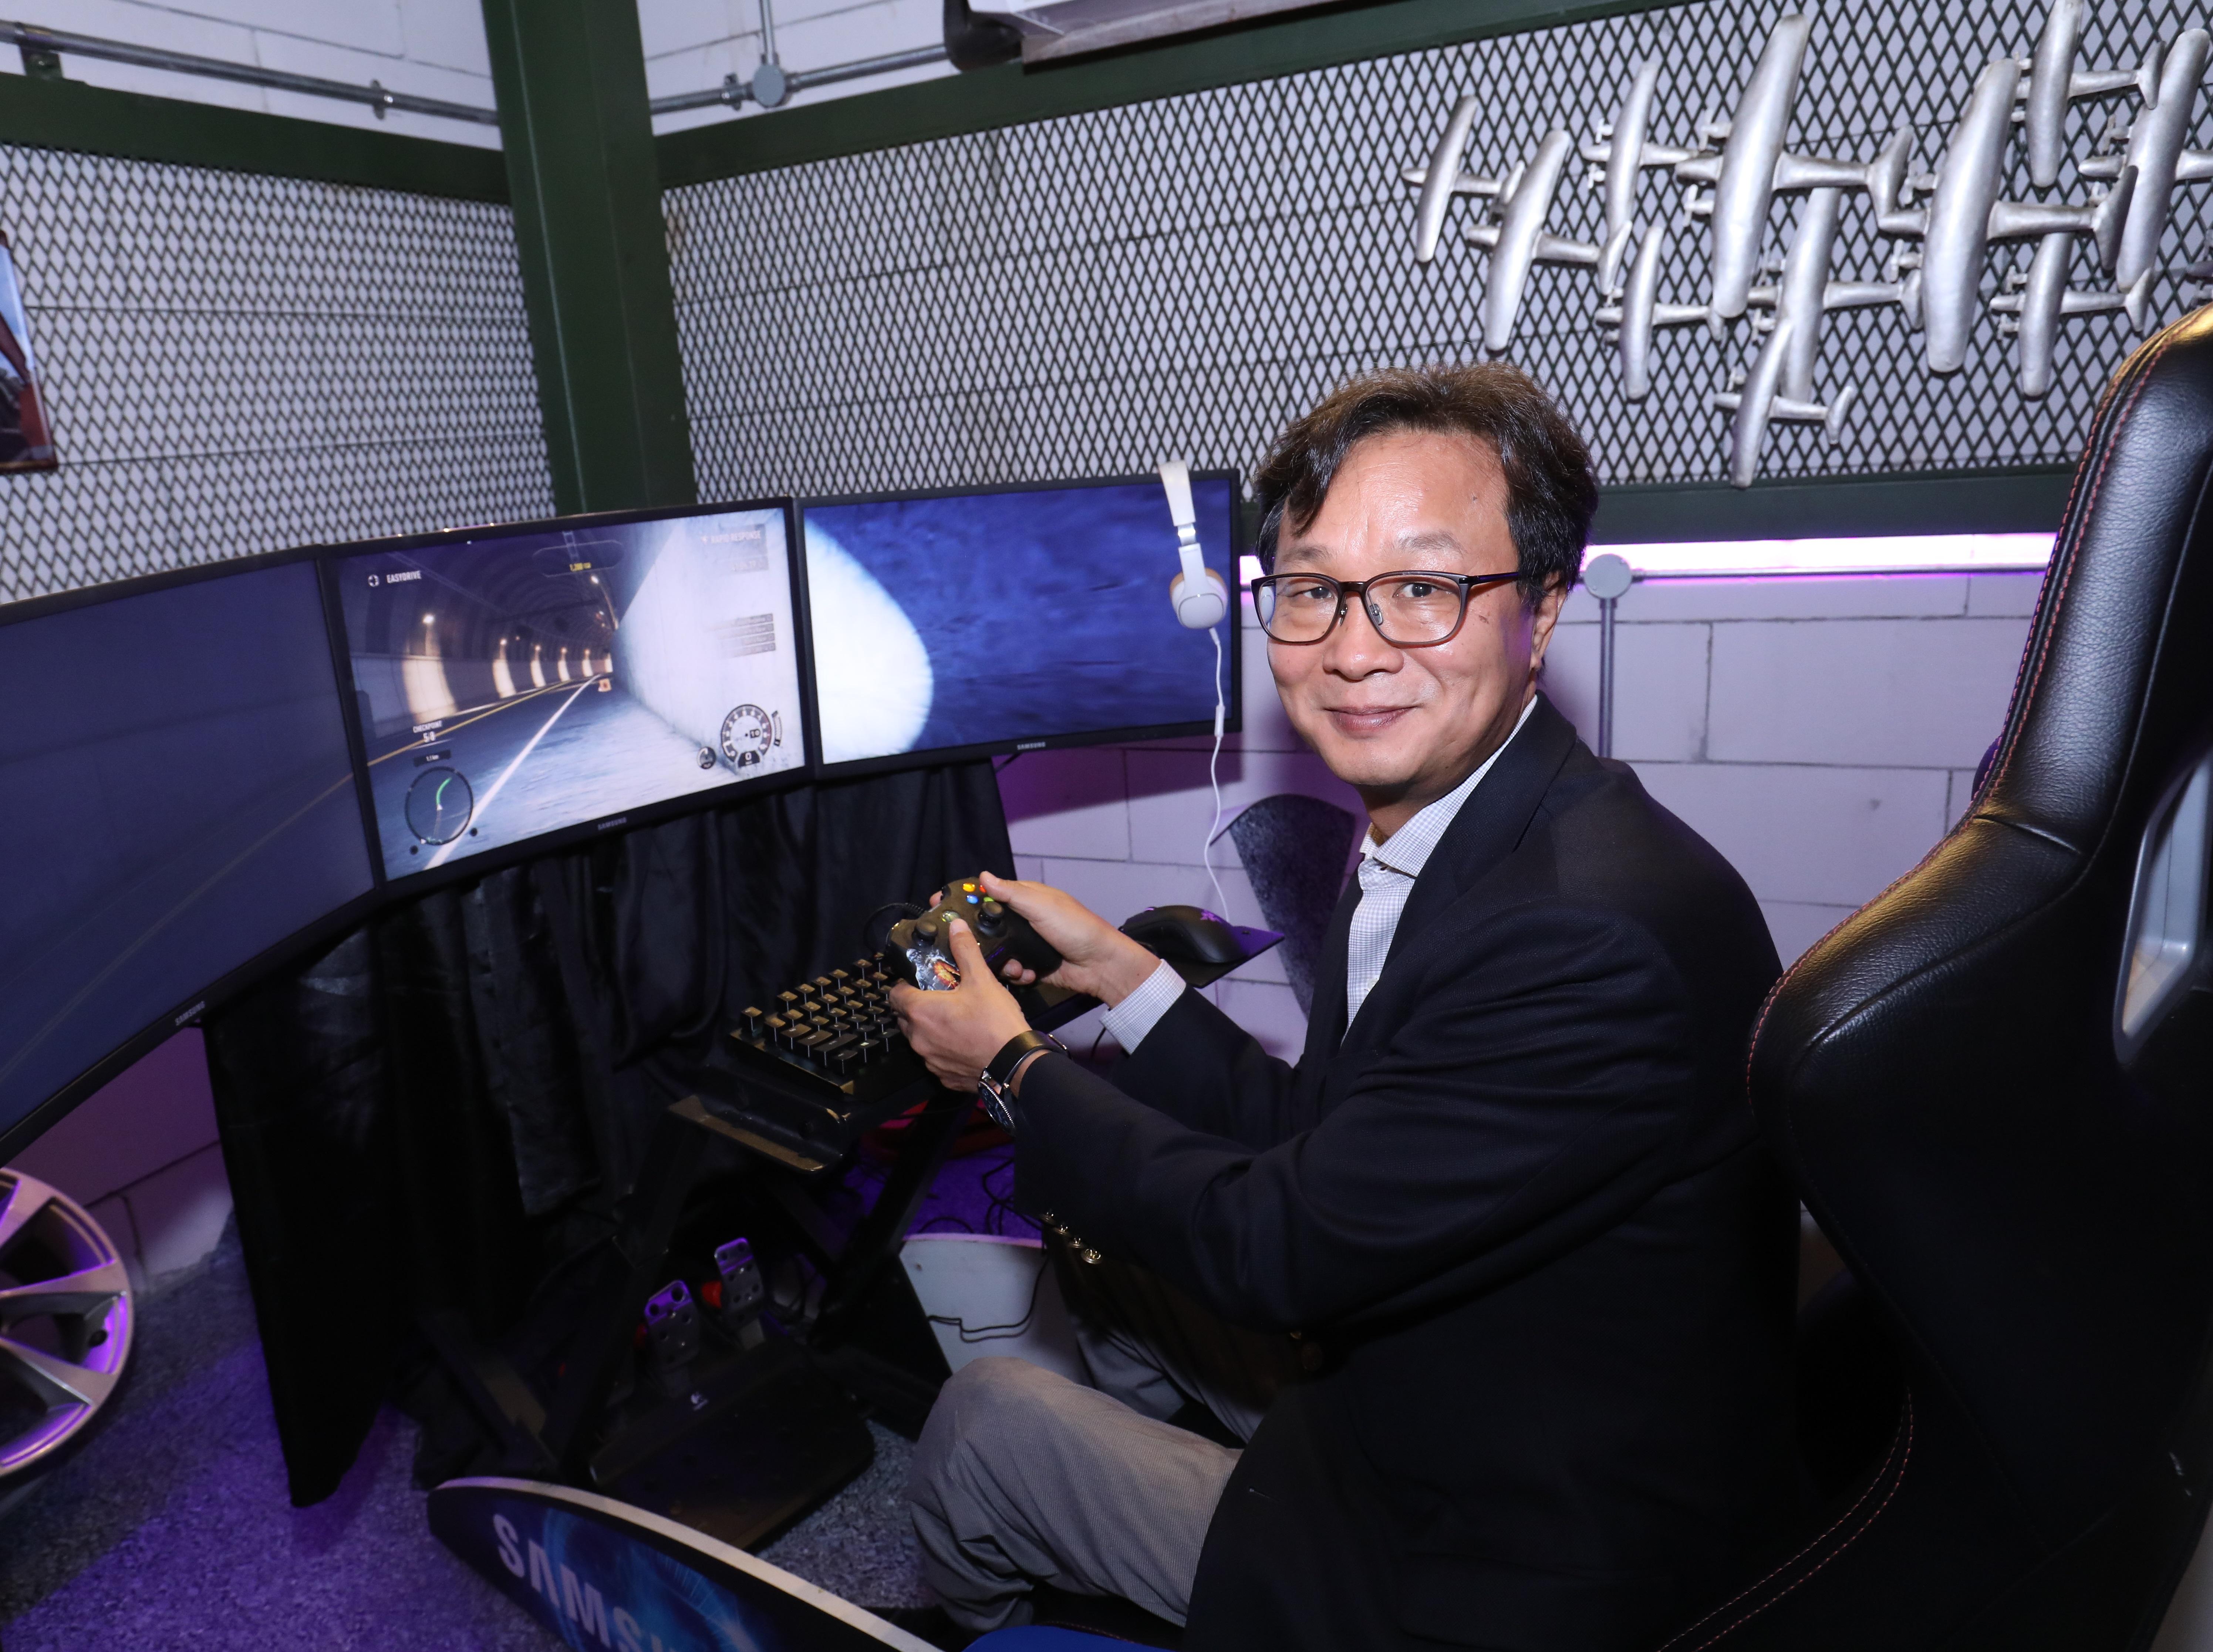 Samsung CFG70 Quantum Dot Curved Gaming Monitor President Samsung Malaysia Lee Sang Hoon